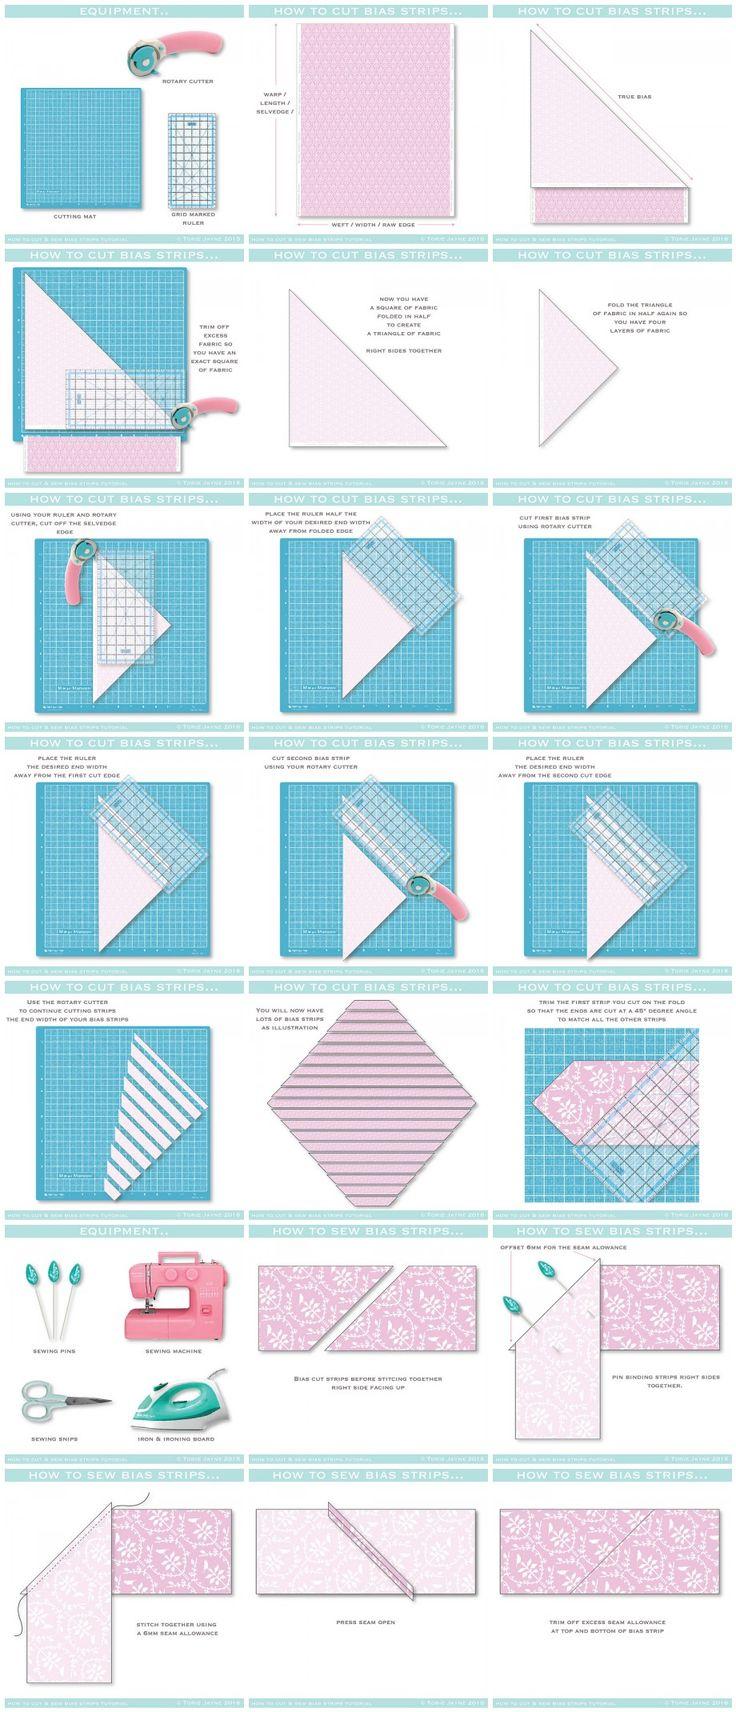 8421 best Quilt patterns images on Pinterest : cutting bias strips for quilt binding - Adamdwight.com